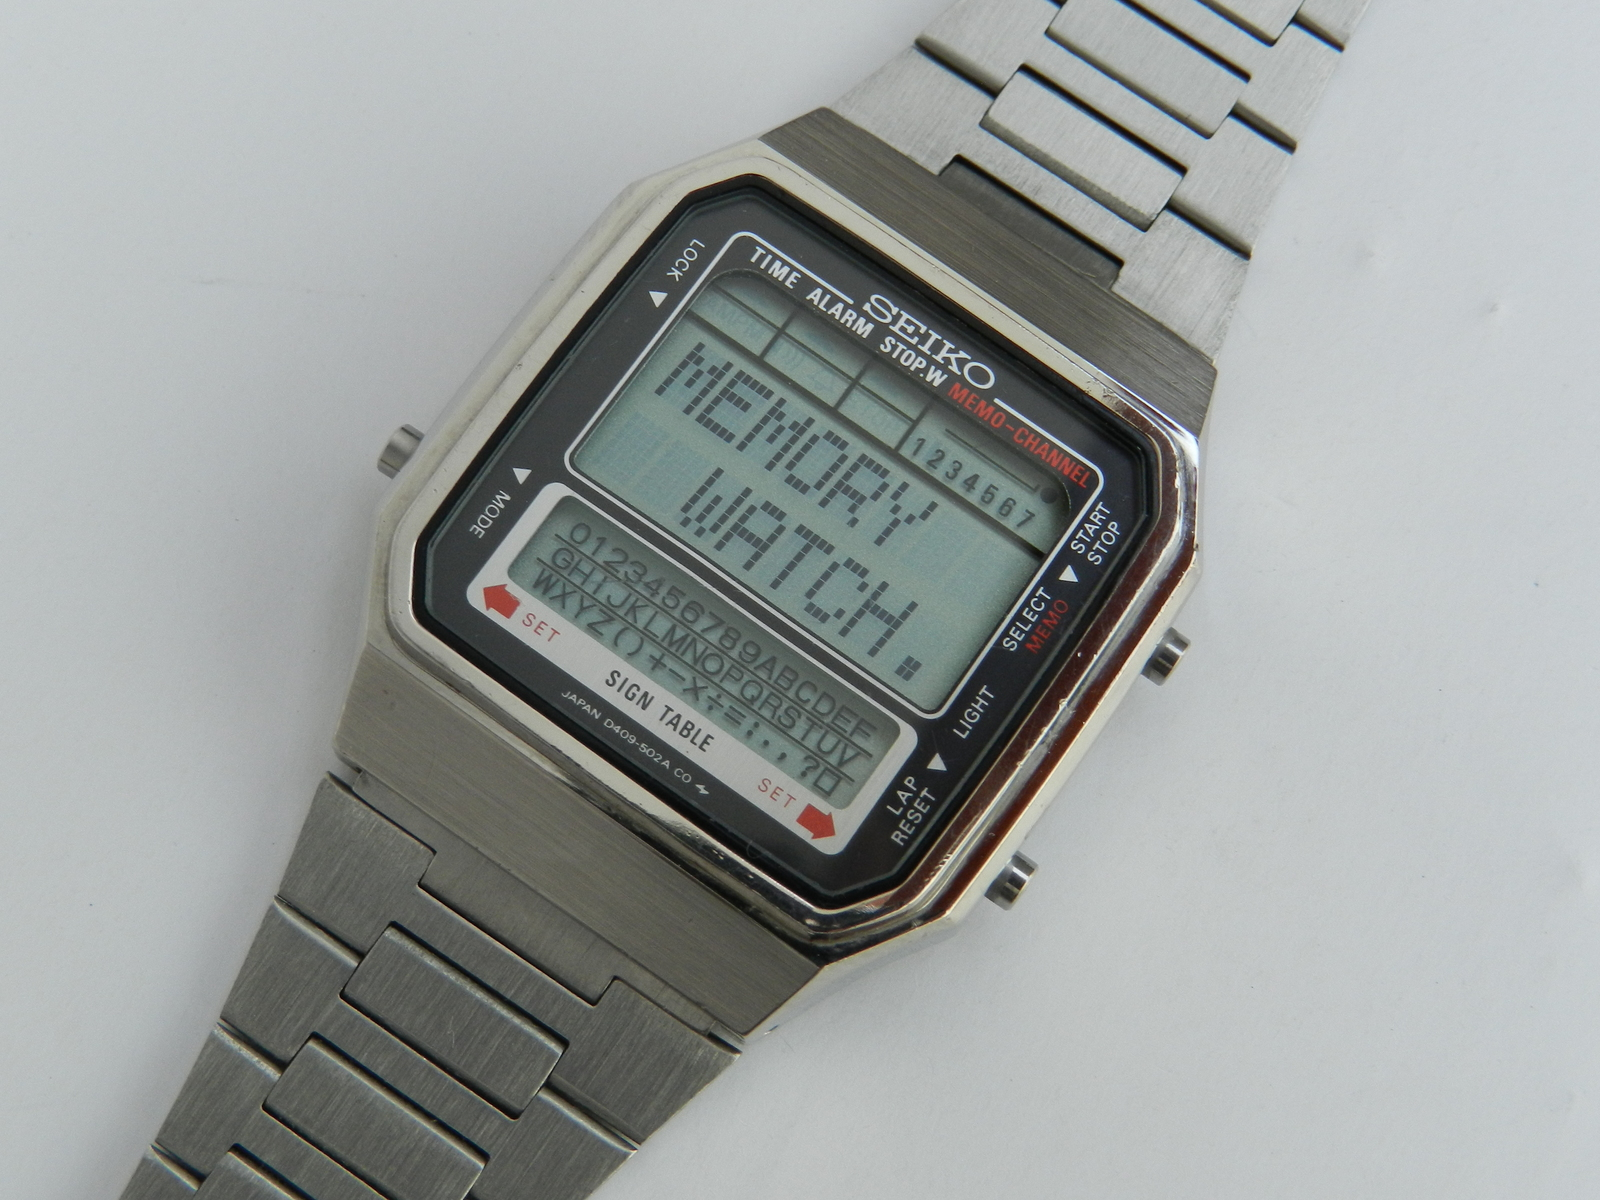 Самые крутые электронные часы 80-х Часы, История, Ретро, Техника,  Электроника 6e6dc053f4c